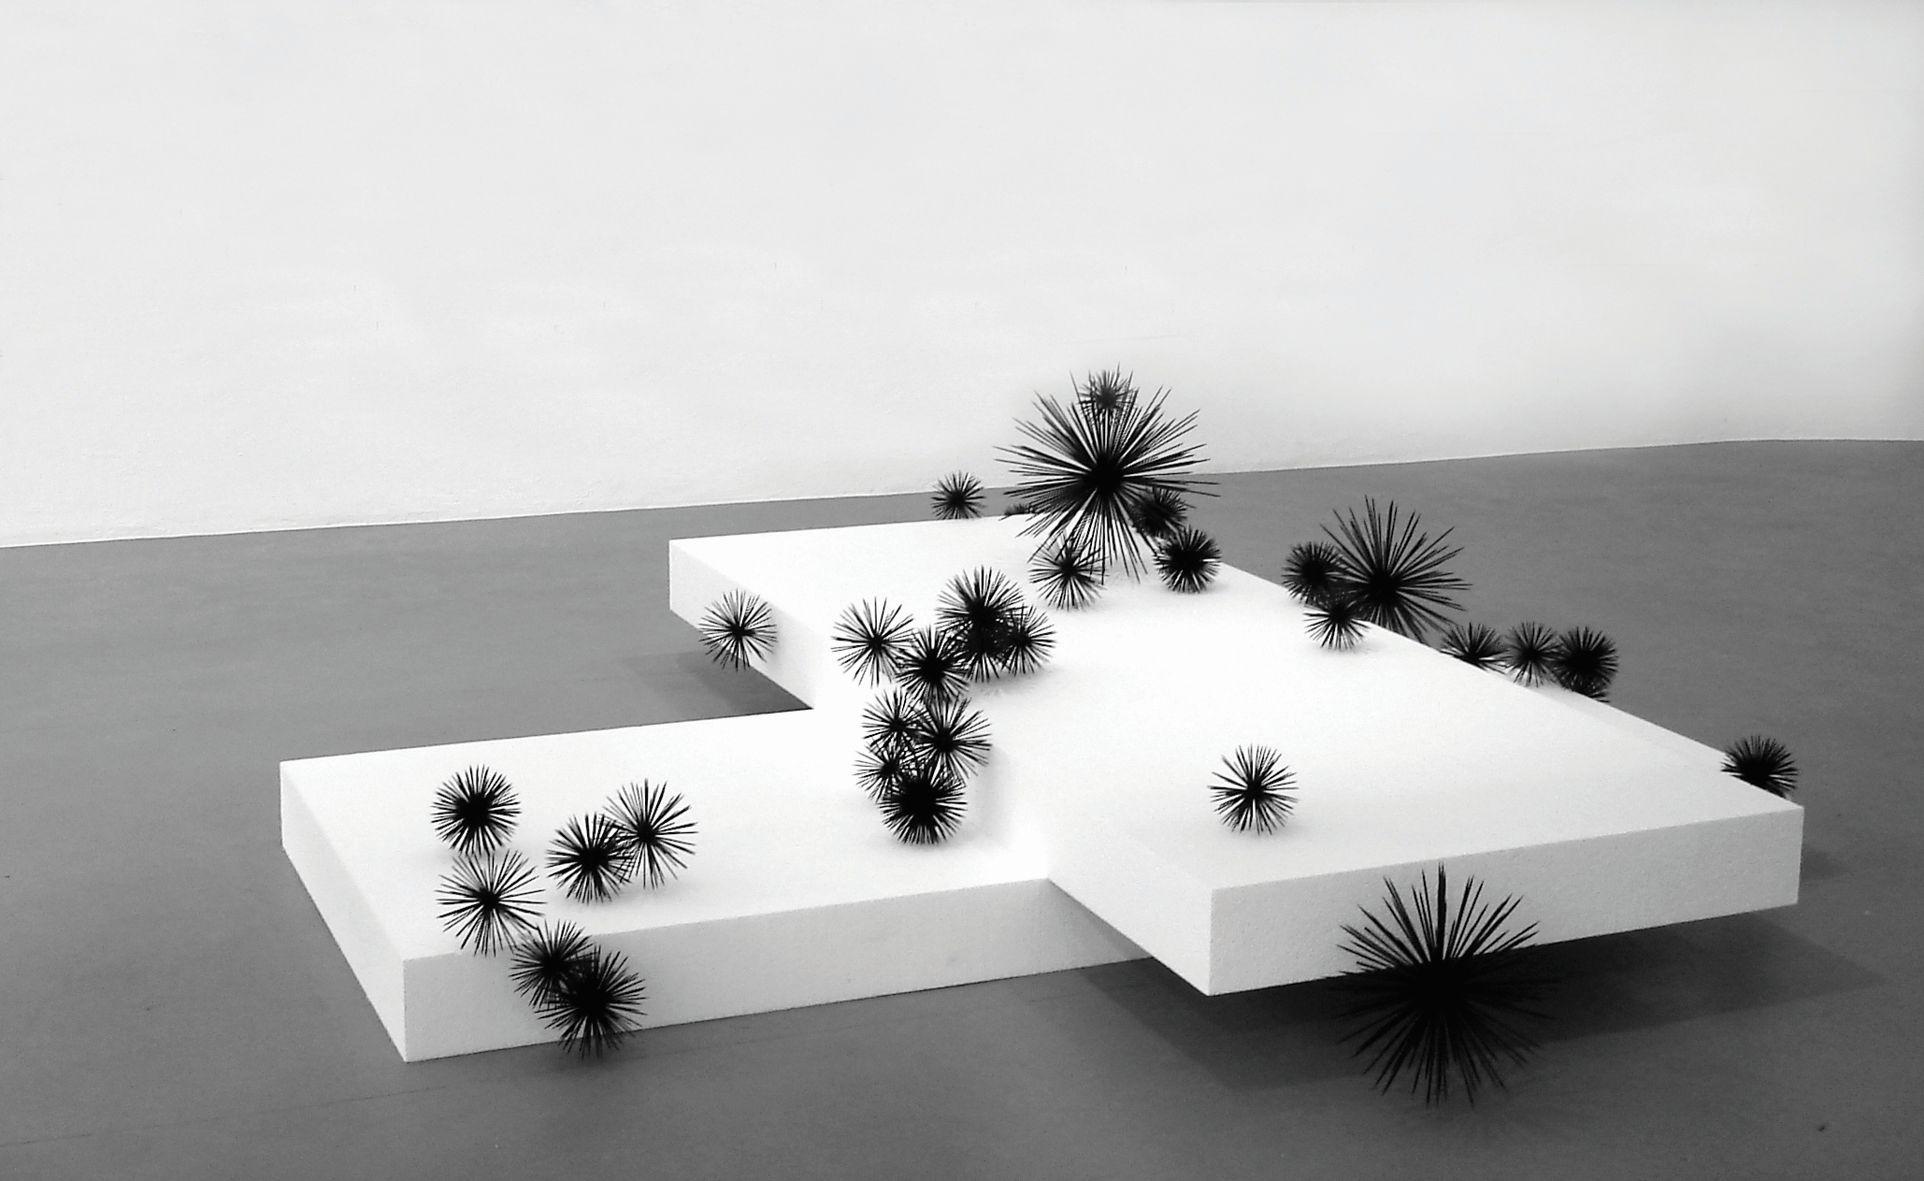 Franziska Furter, Airborne, 2007, polystyrène, bois, colle, peinture, dimensions variables (100 x 250 x 250 cm environ), Frac Alsace © Franziska Furter